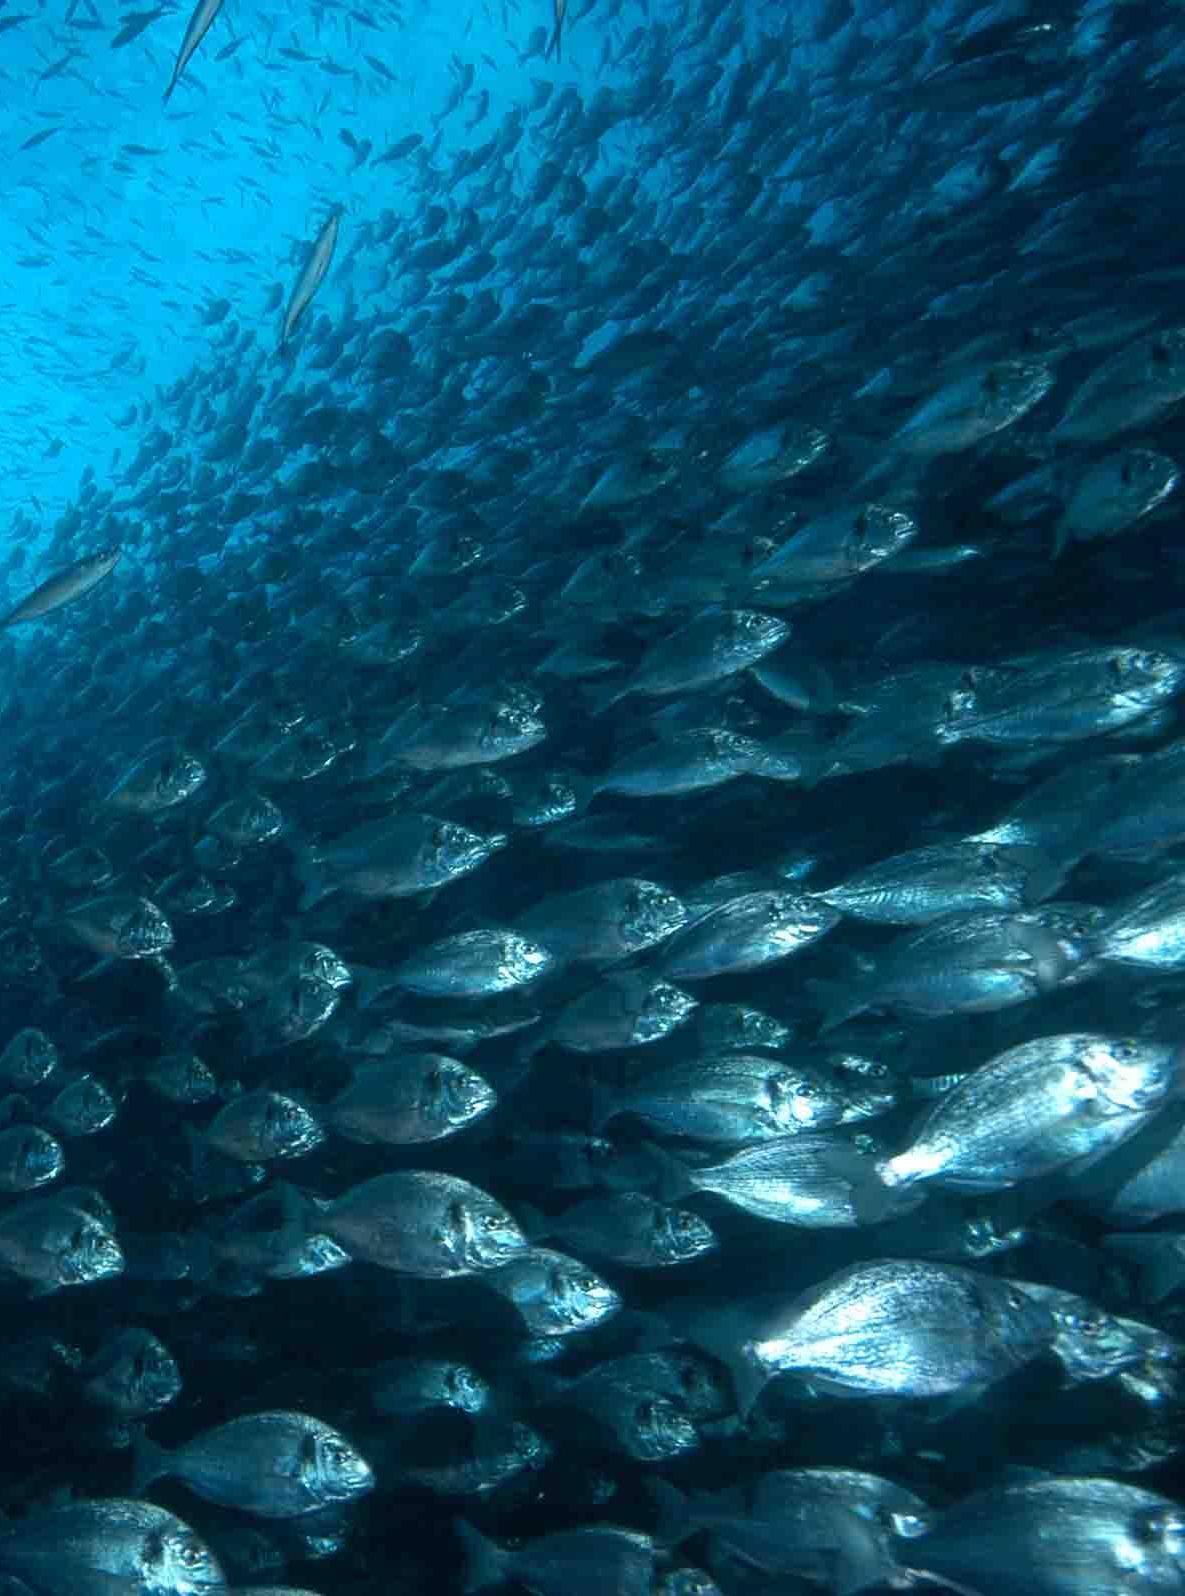 banco de peces acuicultura